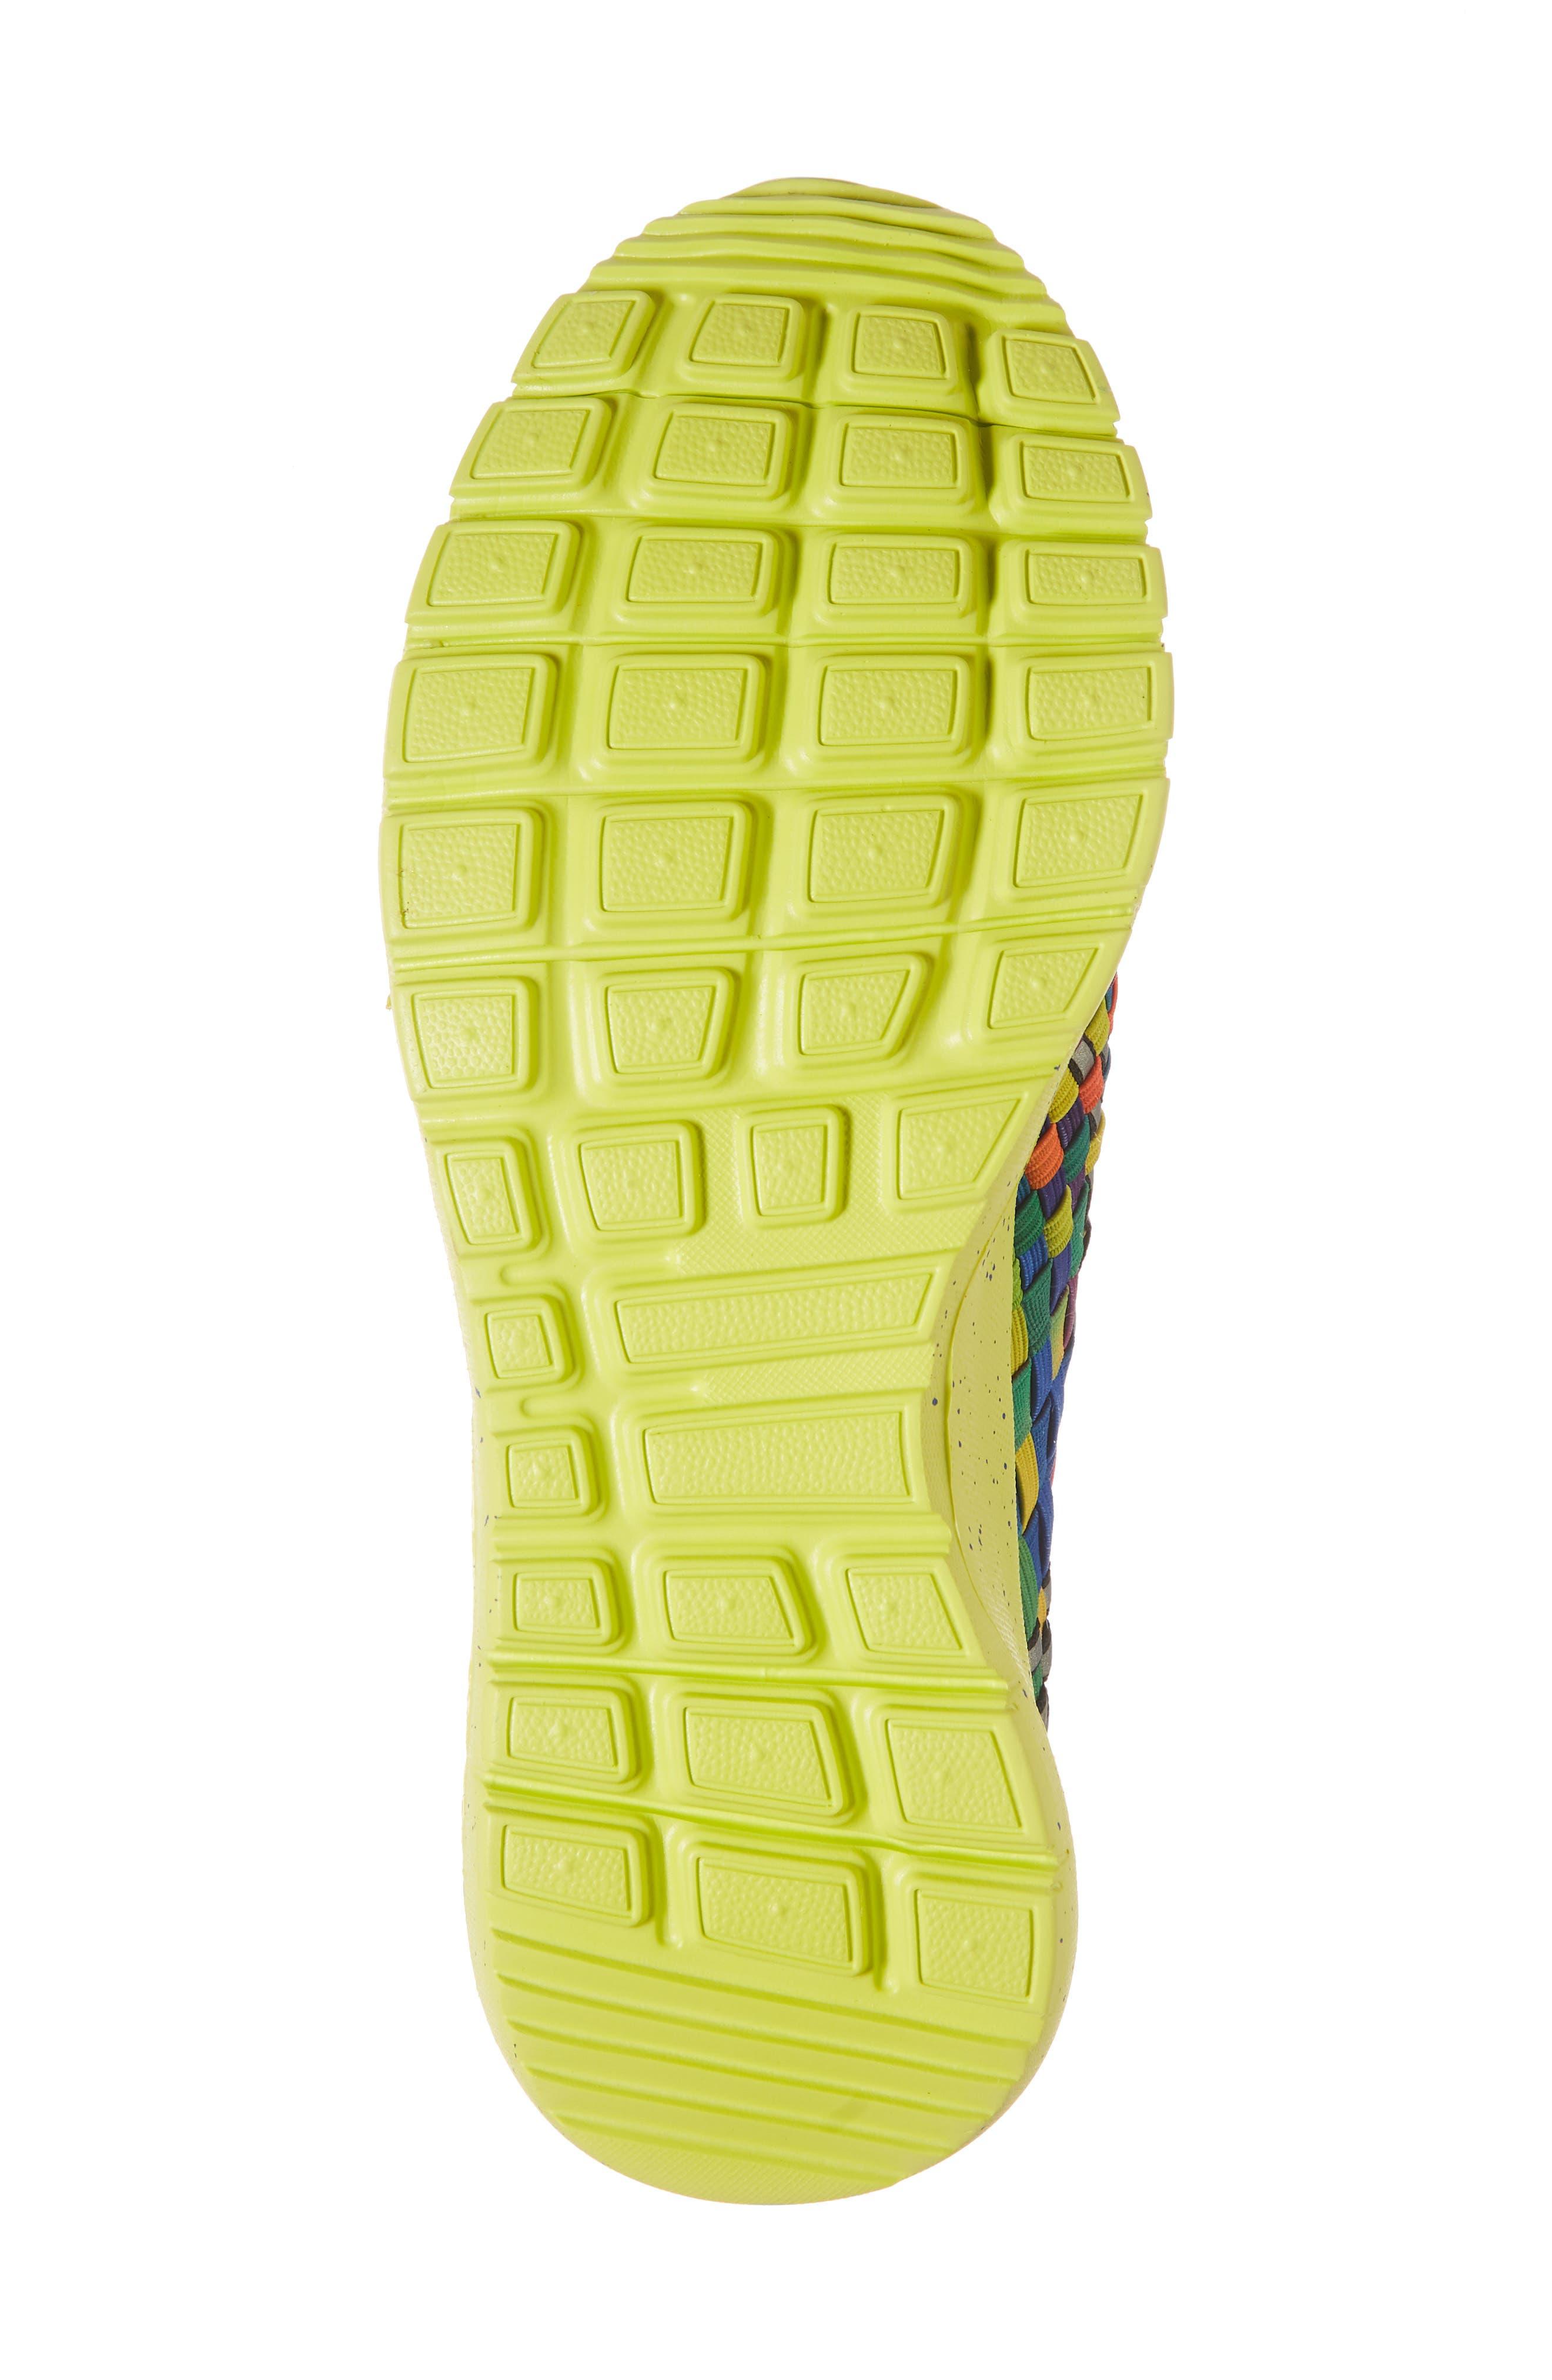 Runners Victoria Sneaker,                             Alternate thumbnail 6, color,                             Black Multi Reflective Fabric